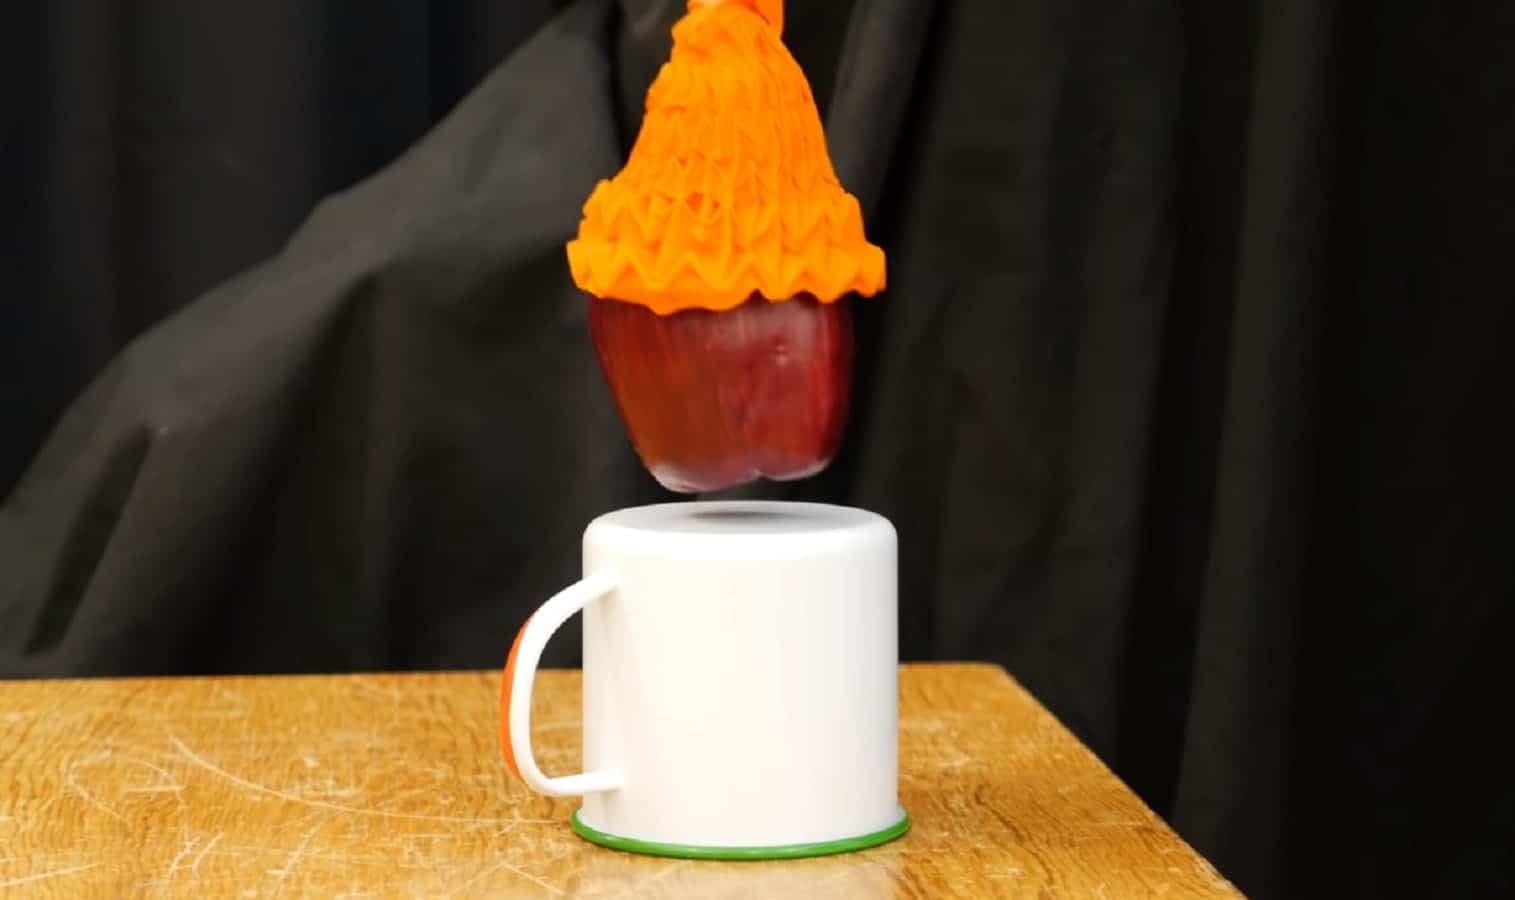 mit robotic gripper arm picking up apple